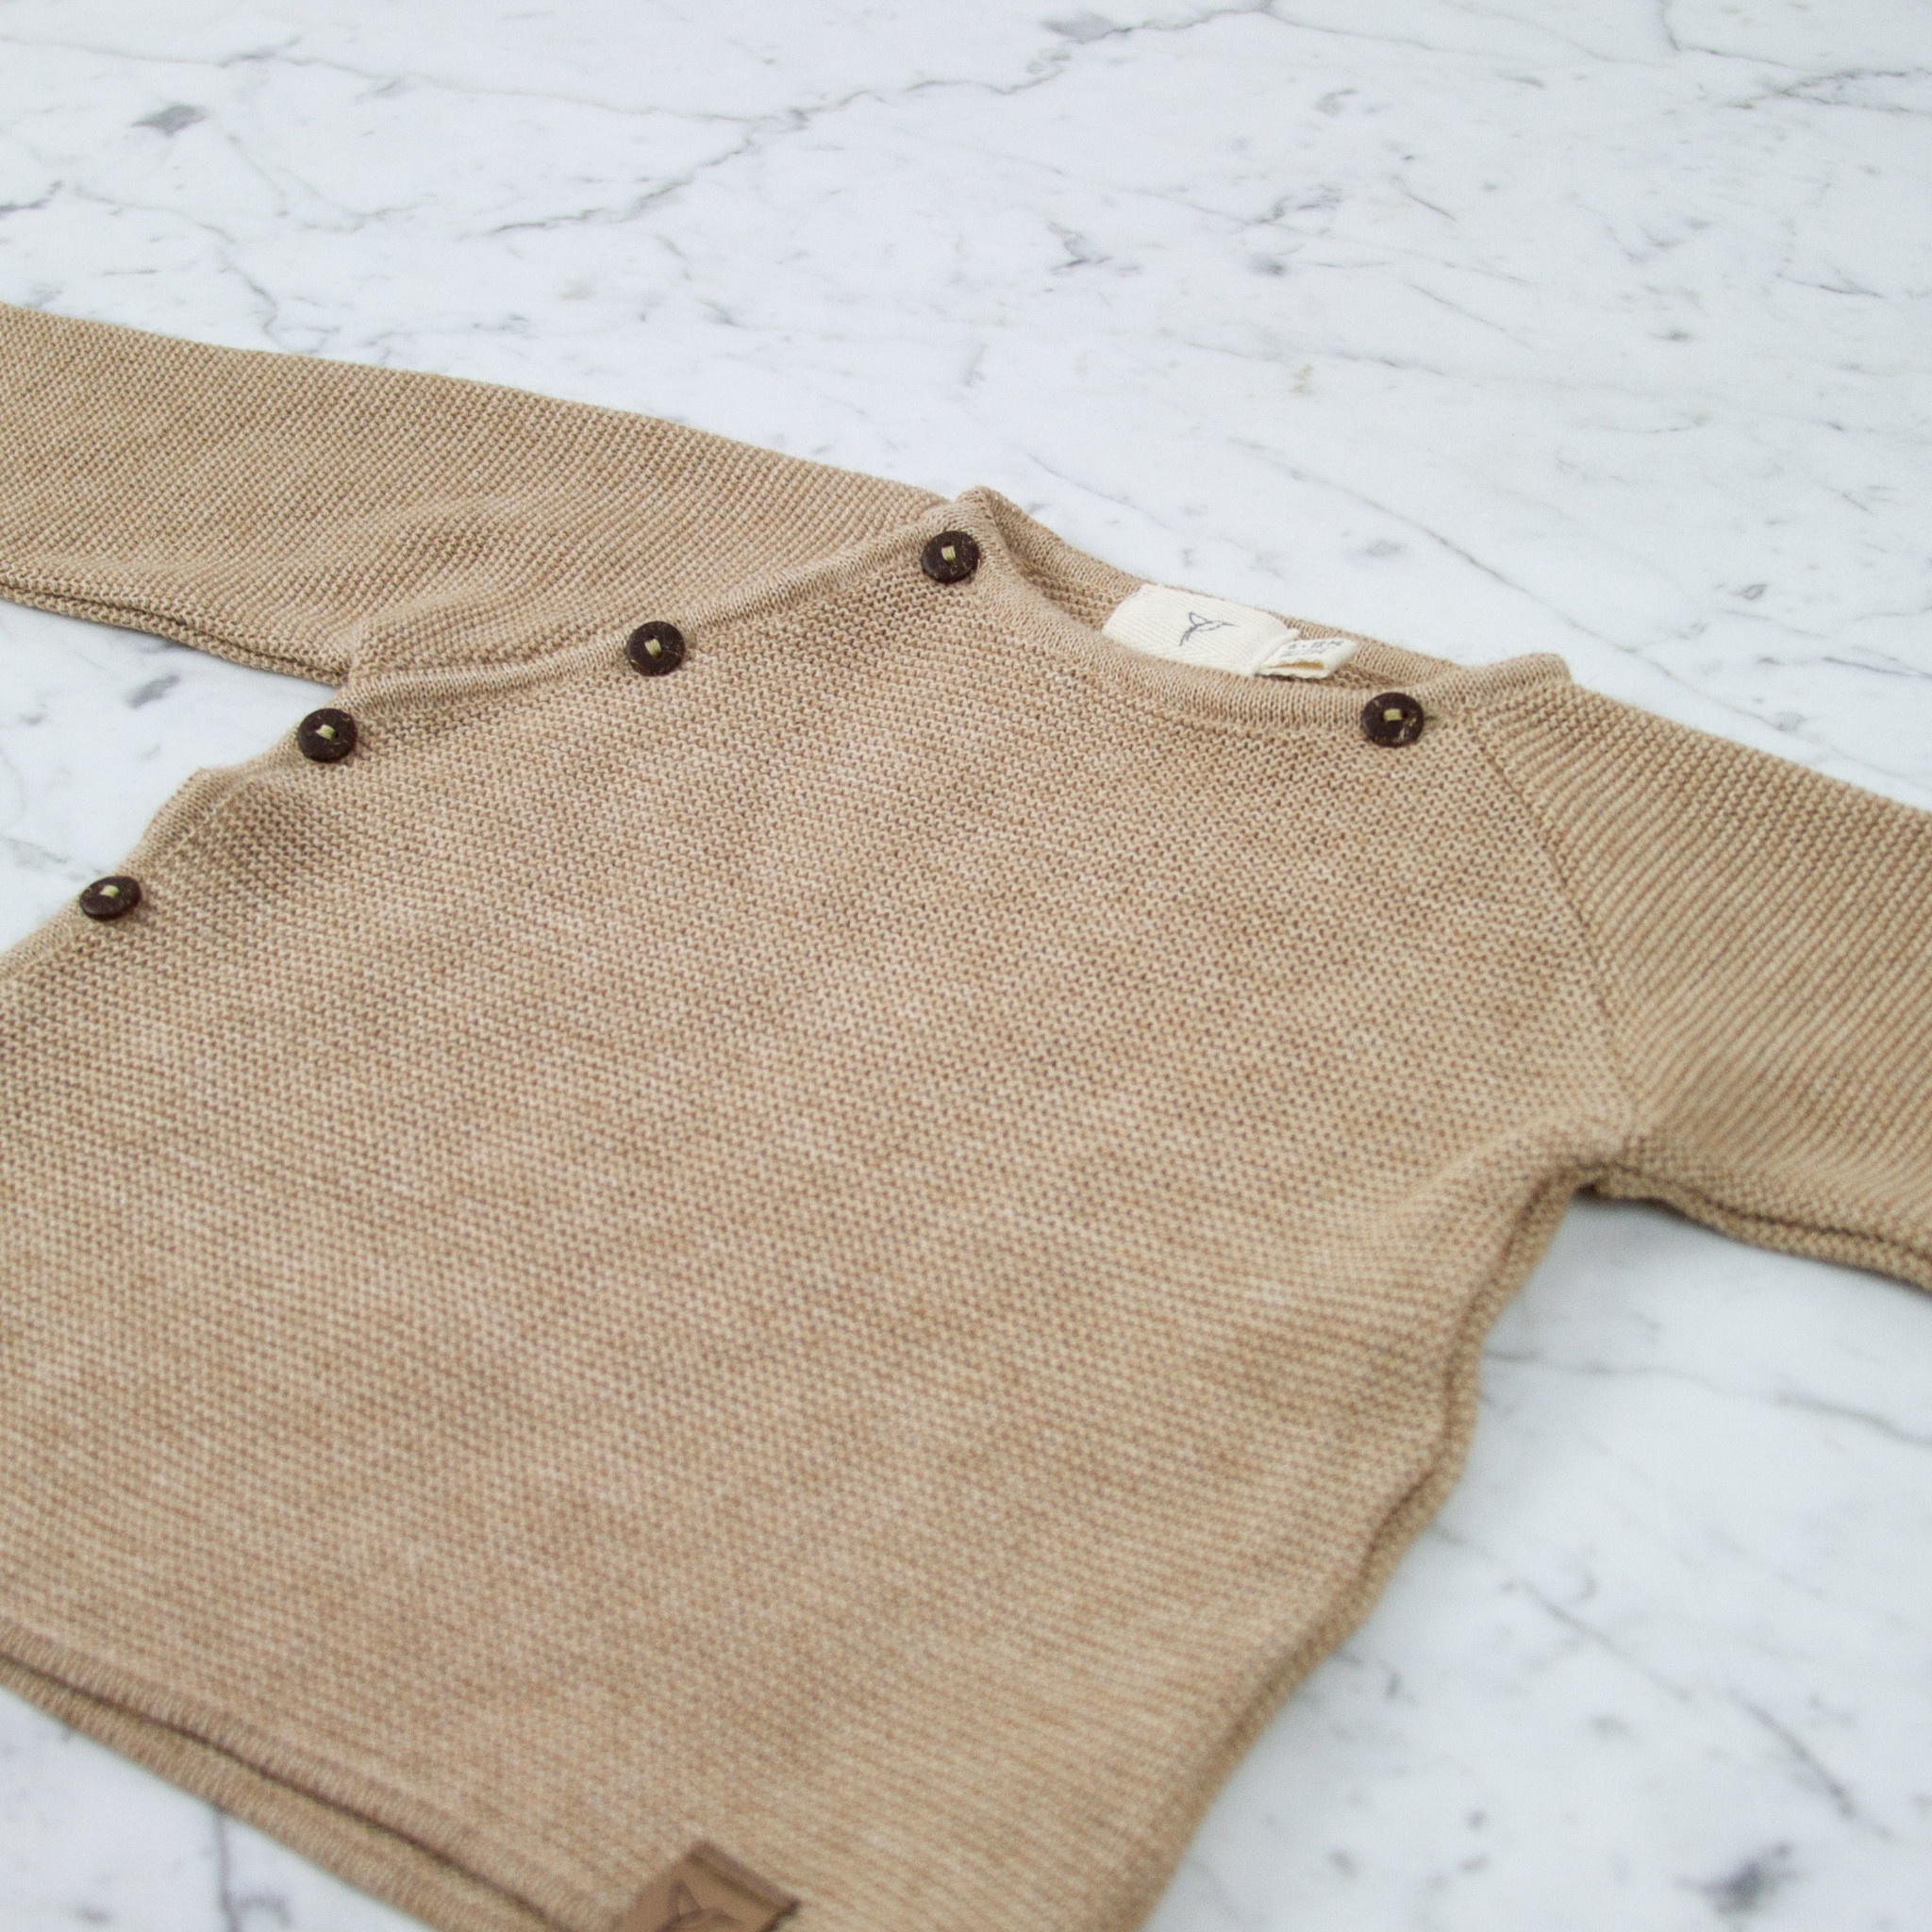 Petit Kolibri Alpaca + Cotton Knit Jacket Sweater - Brown - 6-12 Month